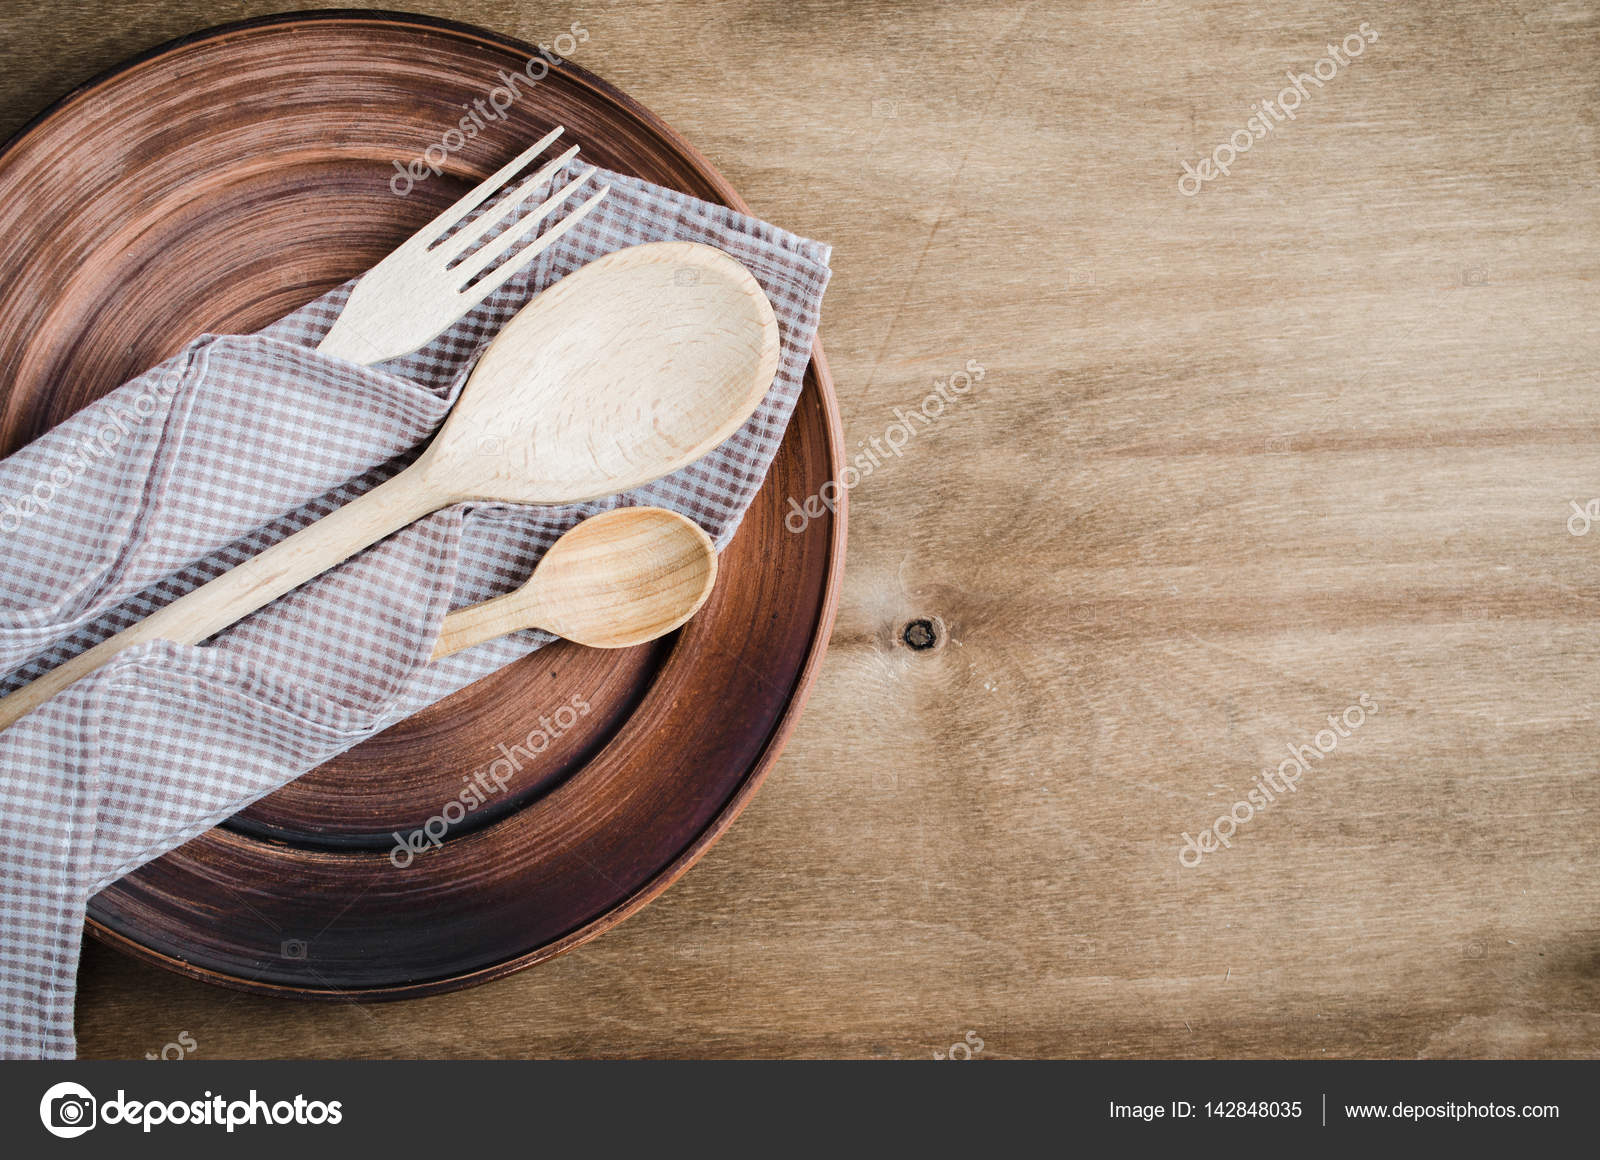 Rustikale Küchenutensilien. Haushaltswaren — Stockfoto © Allchonok ...